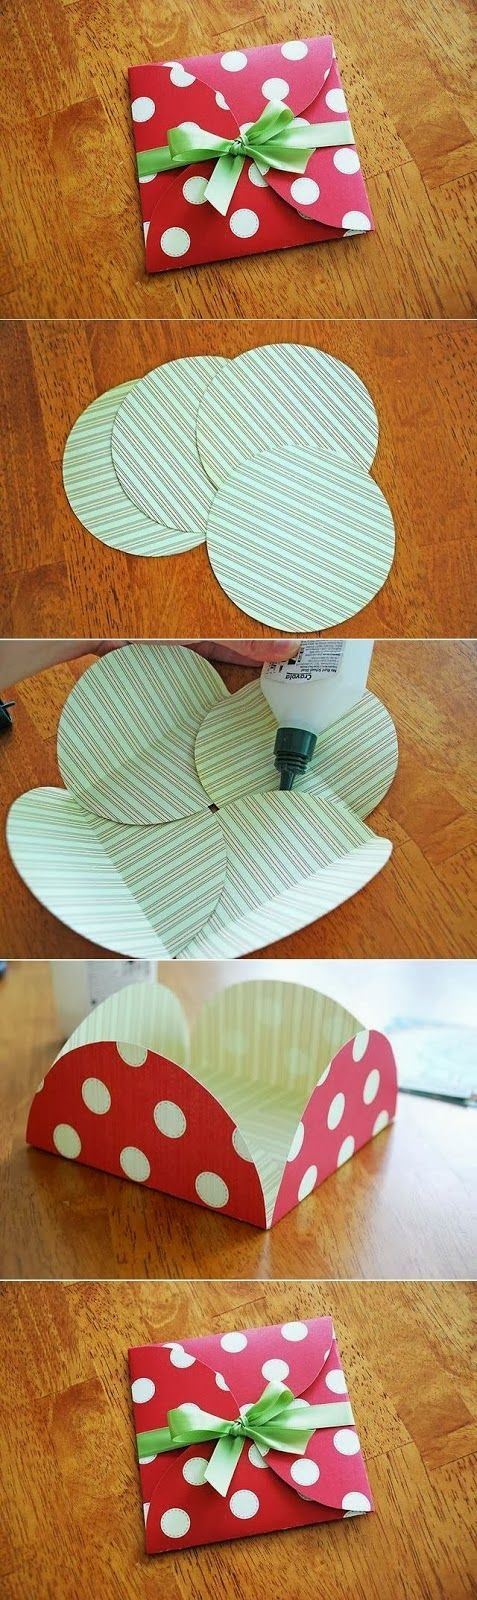 Best DIY Ideas: Make a Simple Beautiful Envelope